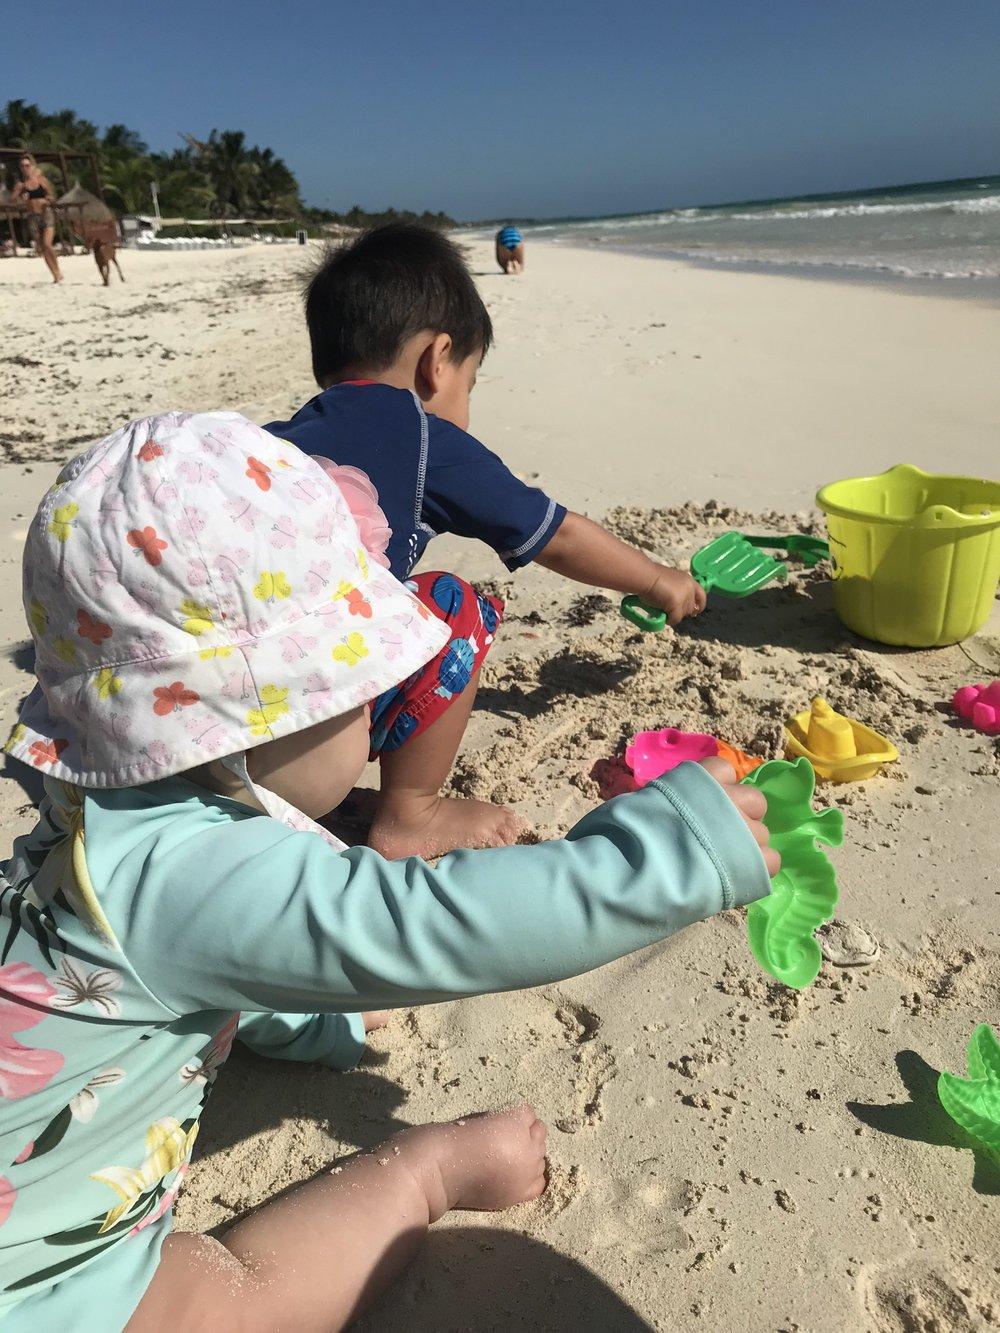 Tulum Beach - La Zebra Beach Club with a baby and a toddler